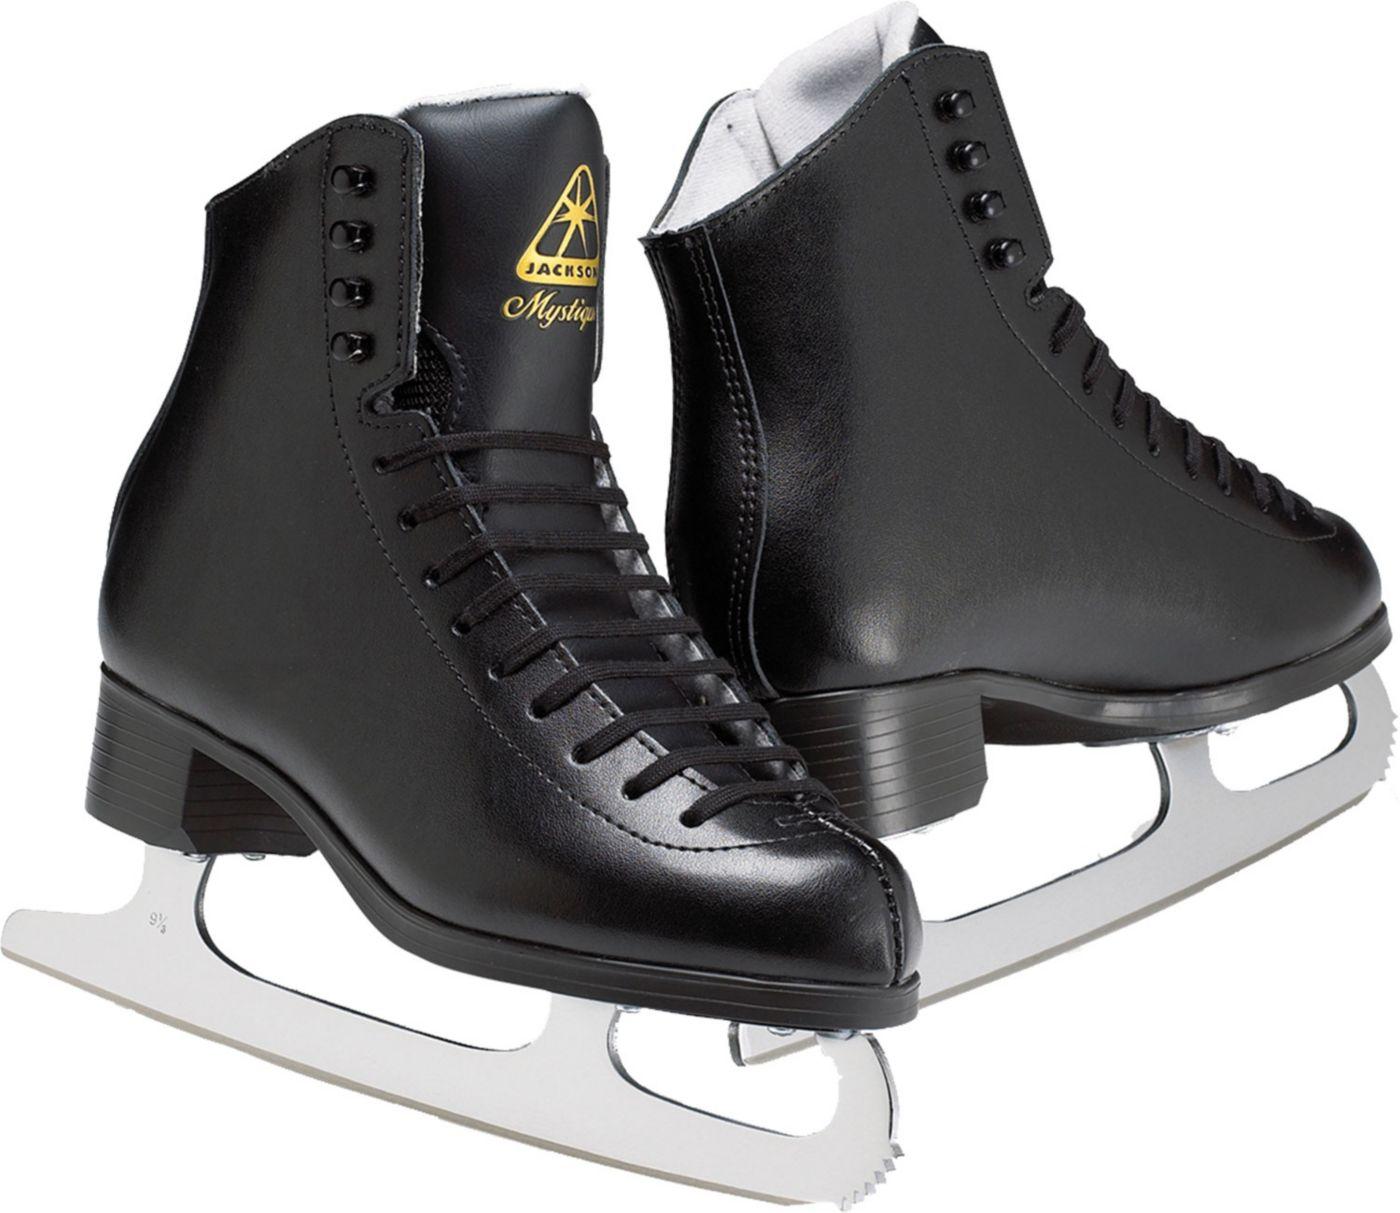 Jackson Ultima Men's Mystique Figure Skates